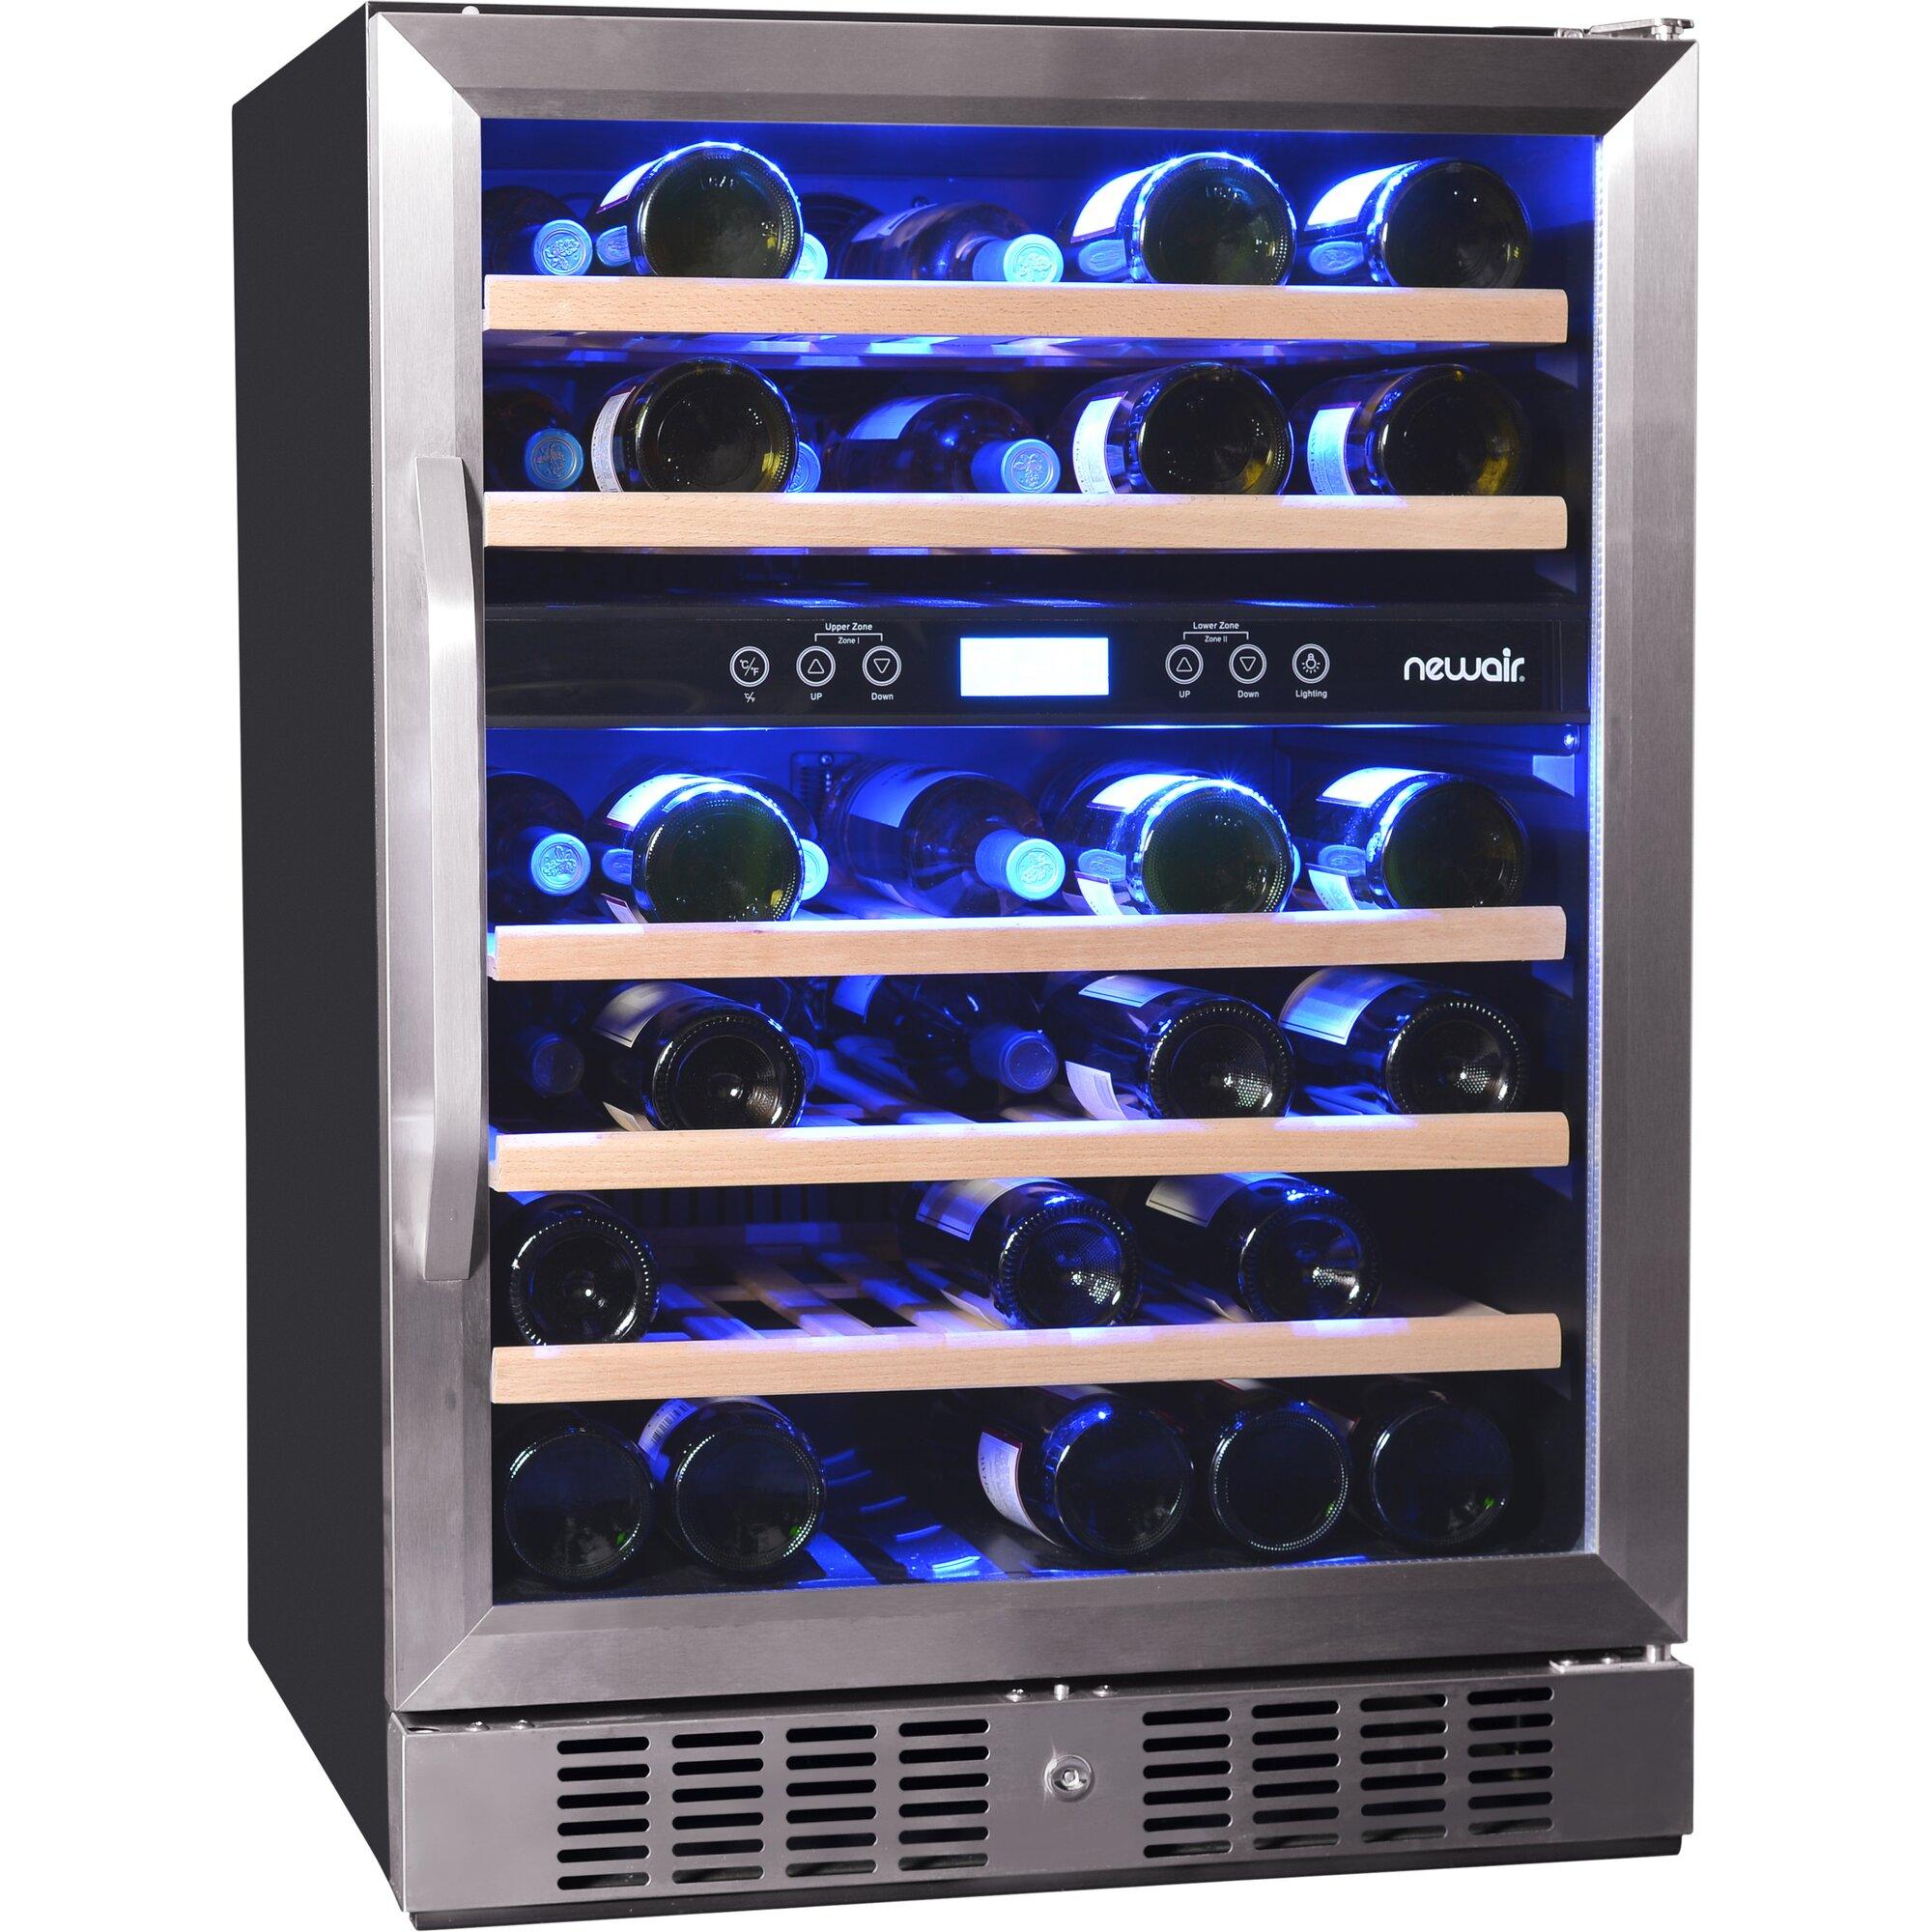 newair 46 bottle dual zone convertible wine cooler reviews wayfair. Black Bedroom Furniture Sets. Home Design Ideas